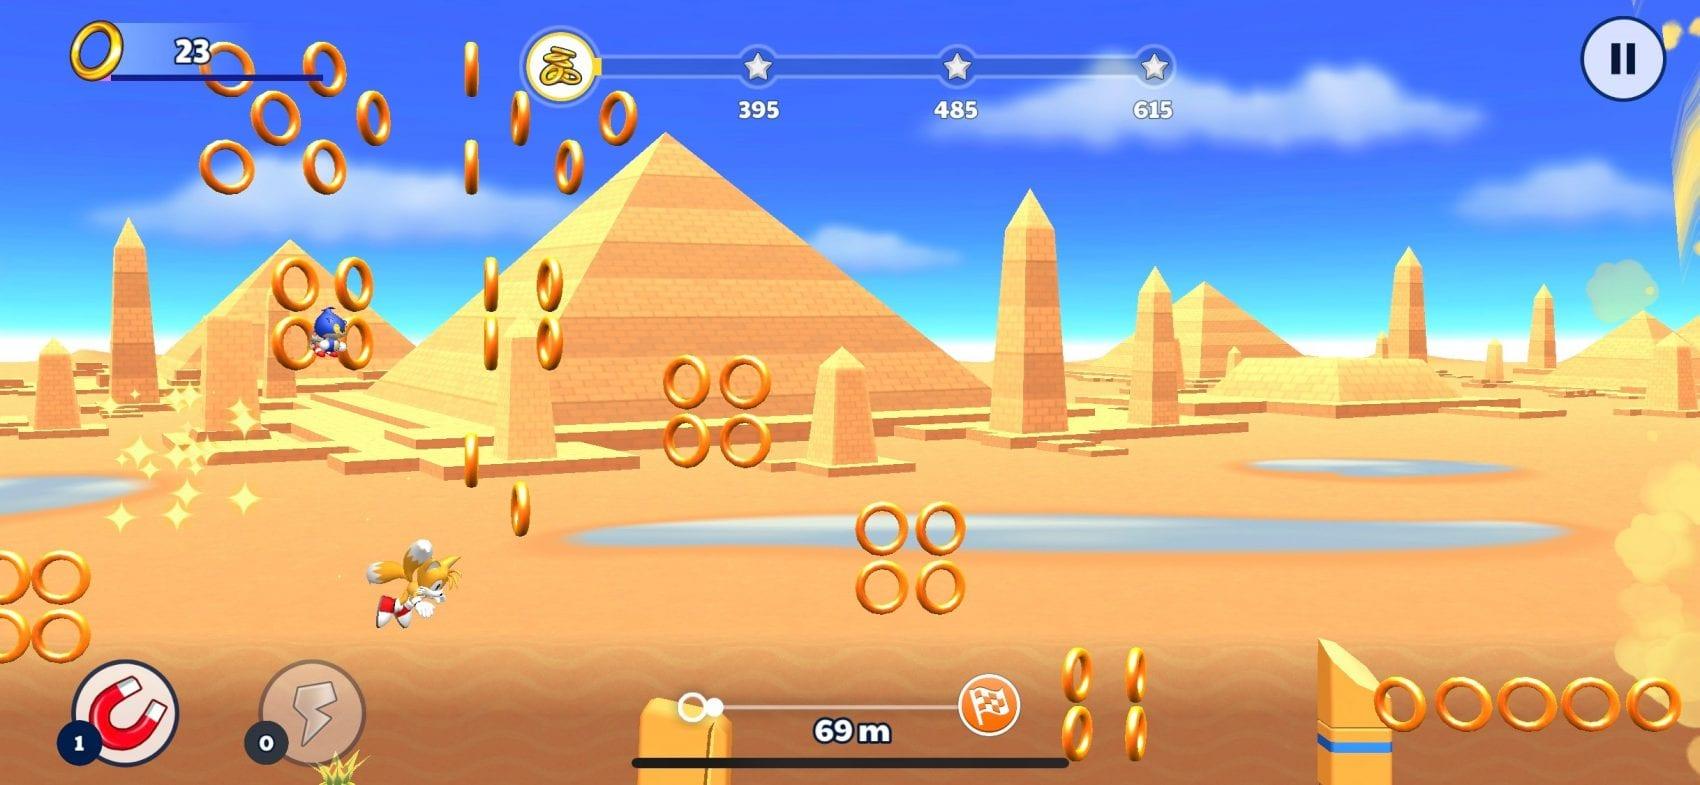 Sonic Runners Adventure Test iOS My Geek Actu Tails